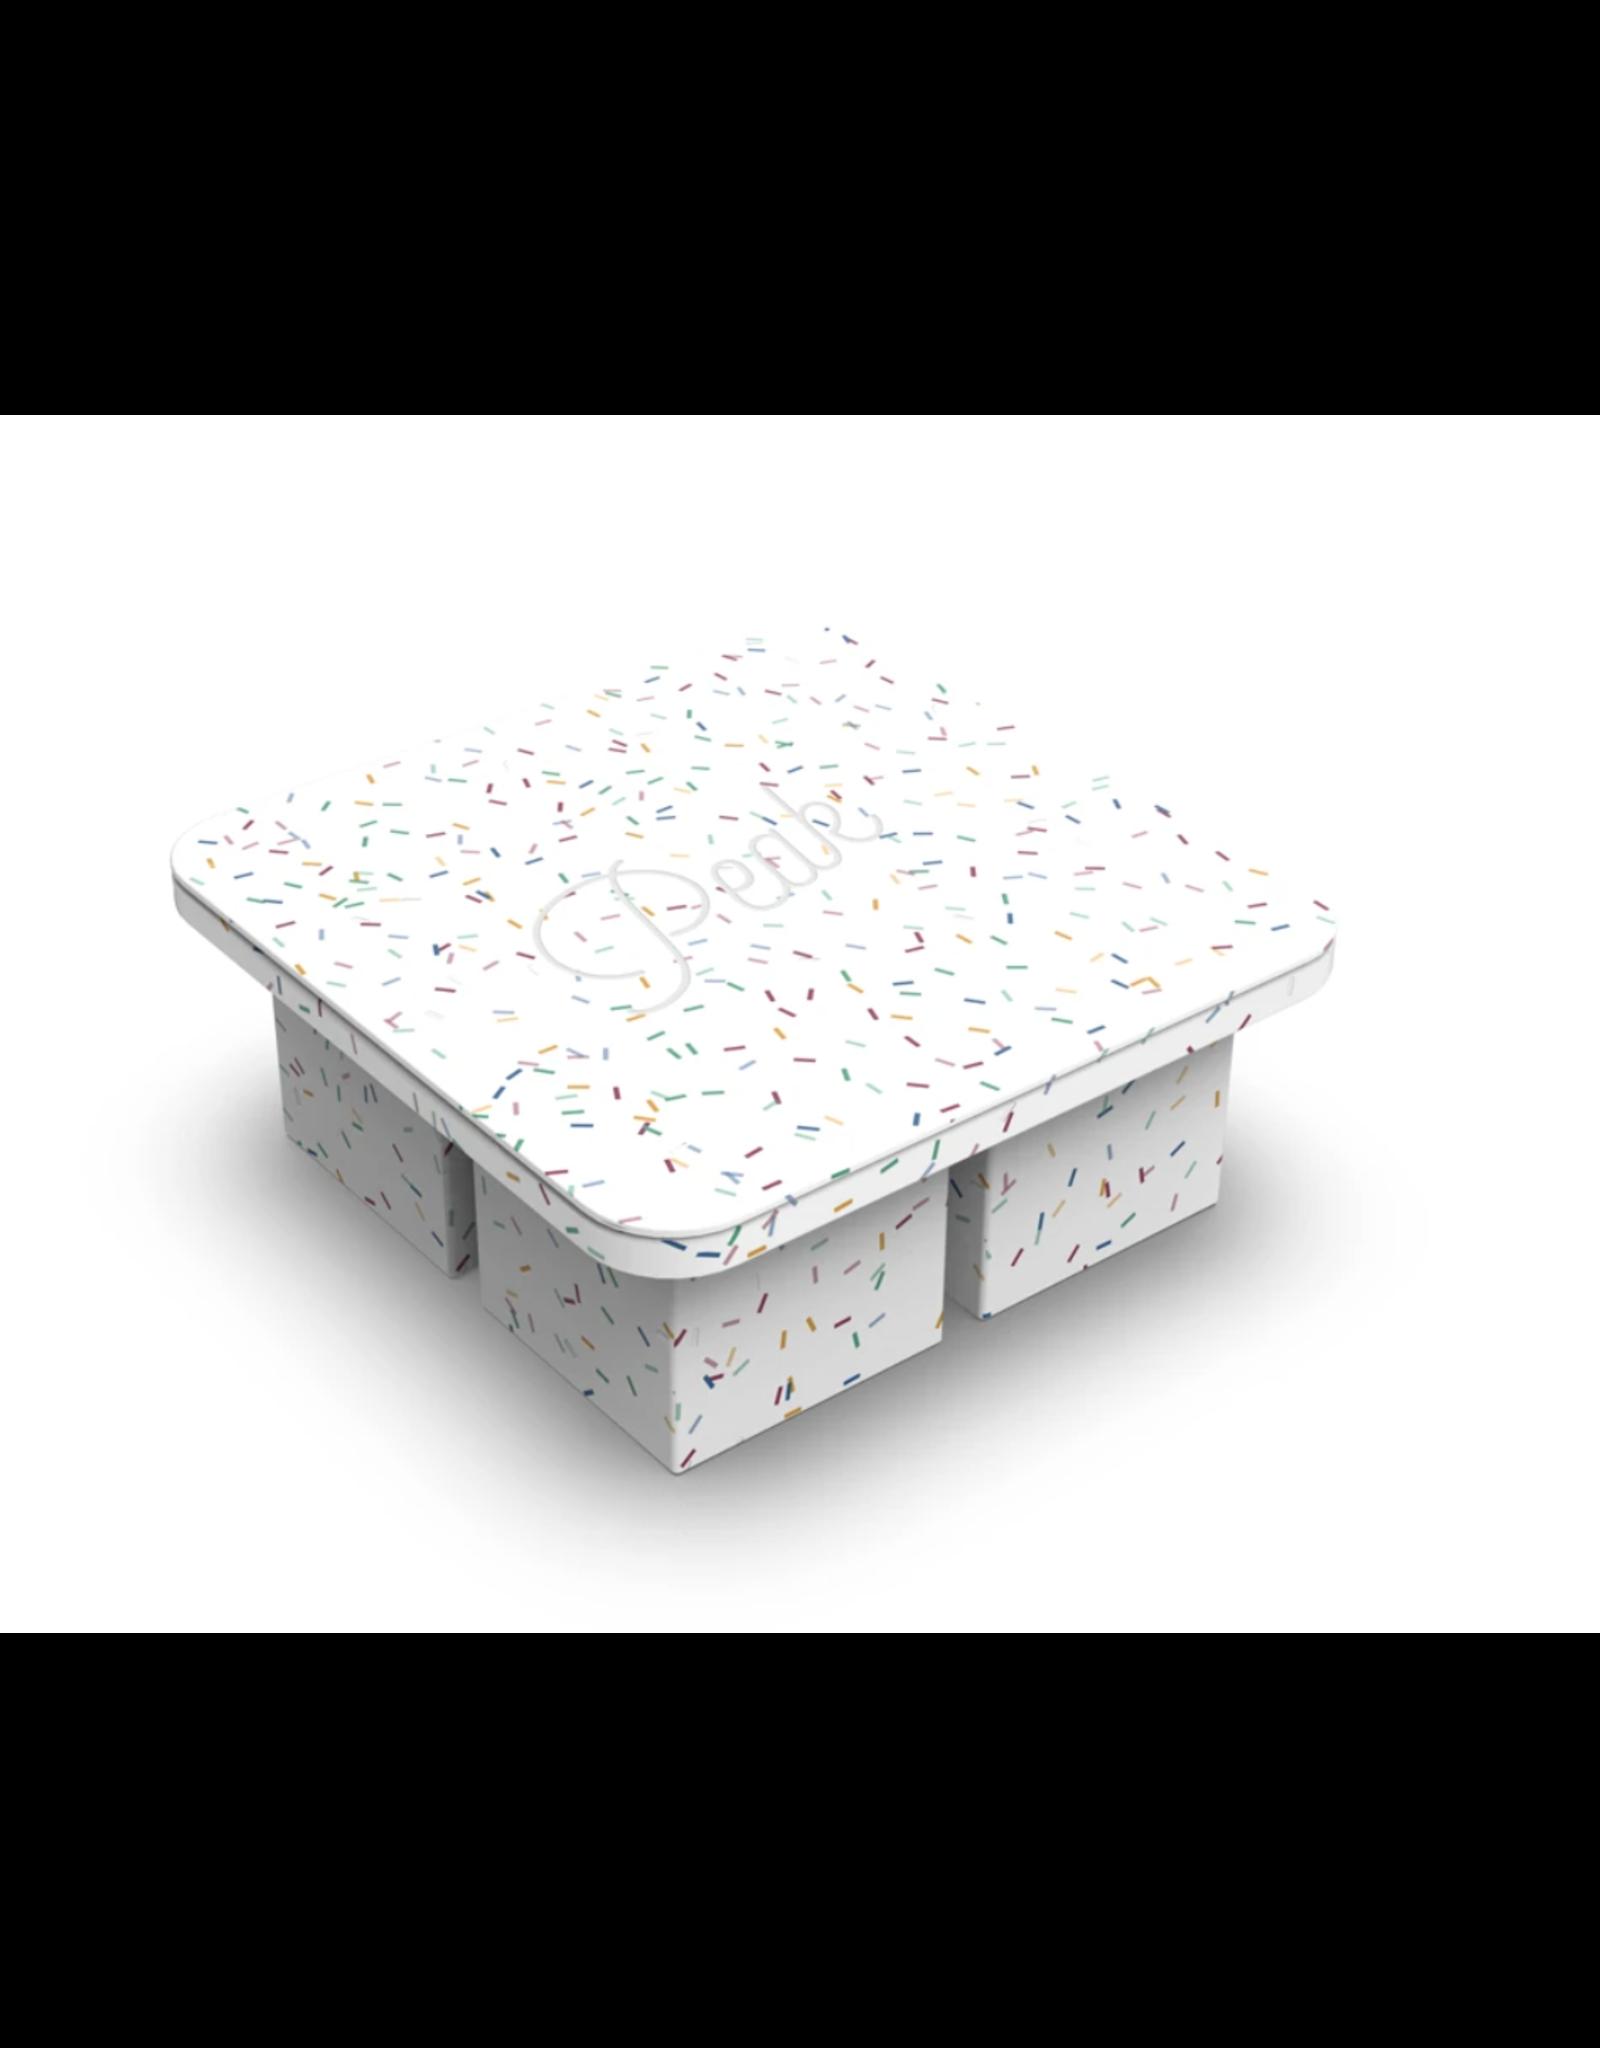 W & P Designs Peak XL Ice Cube Tray - Speckled White